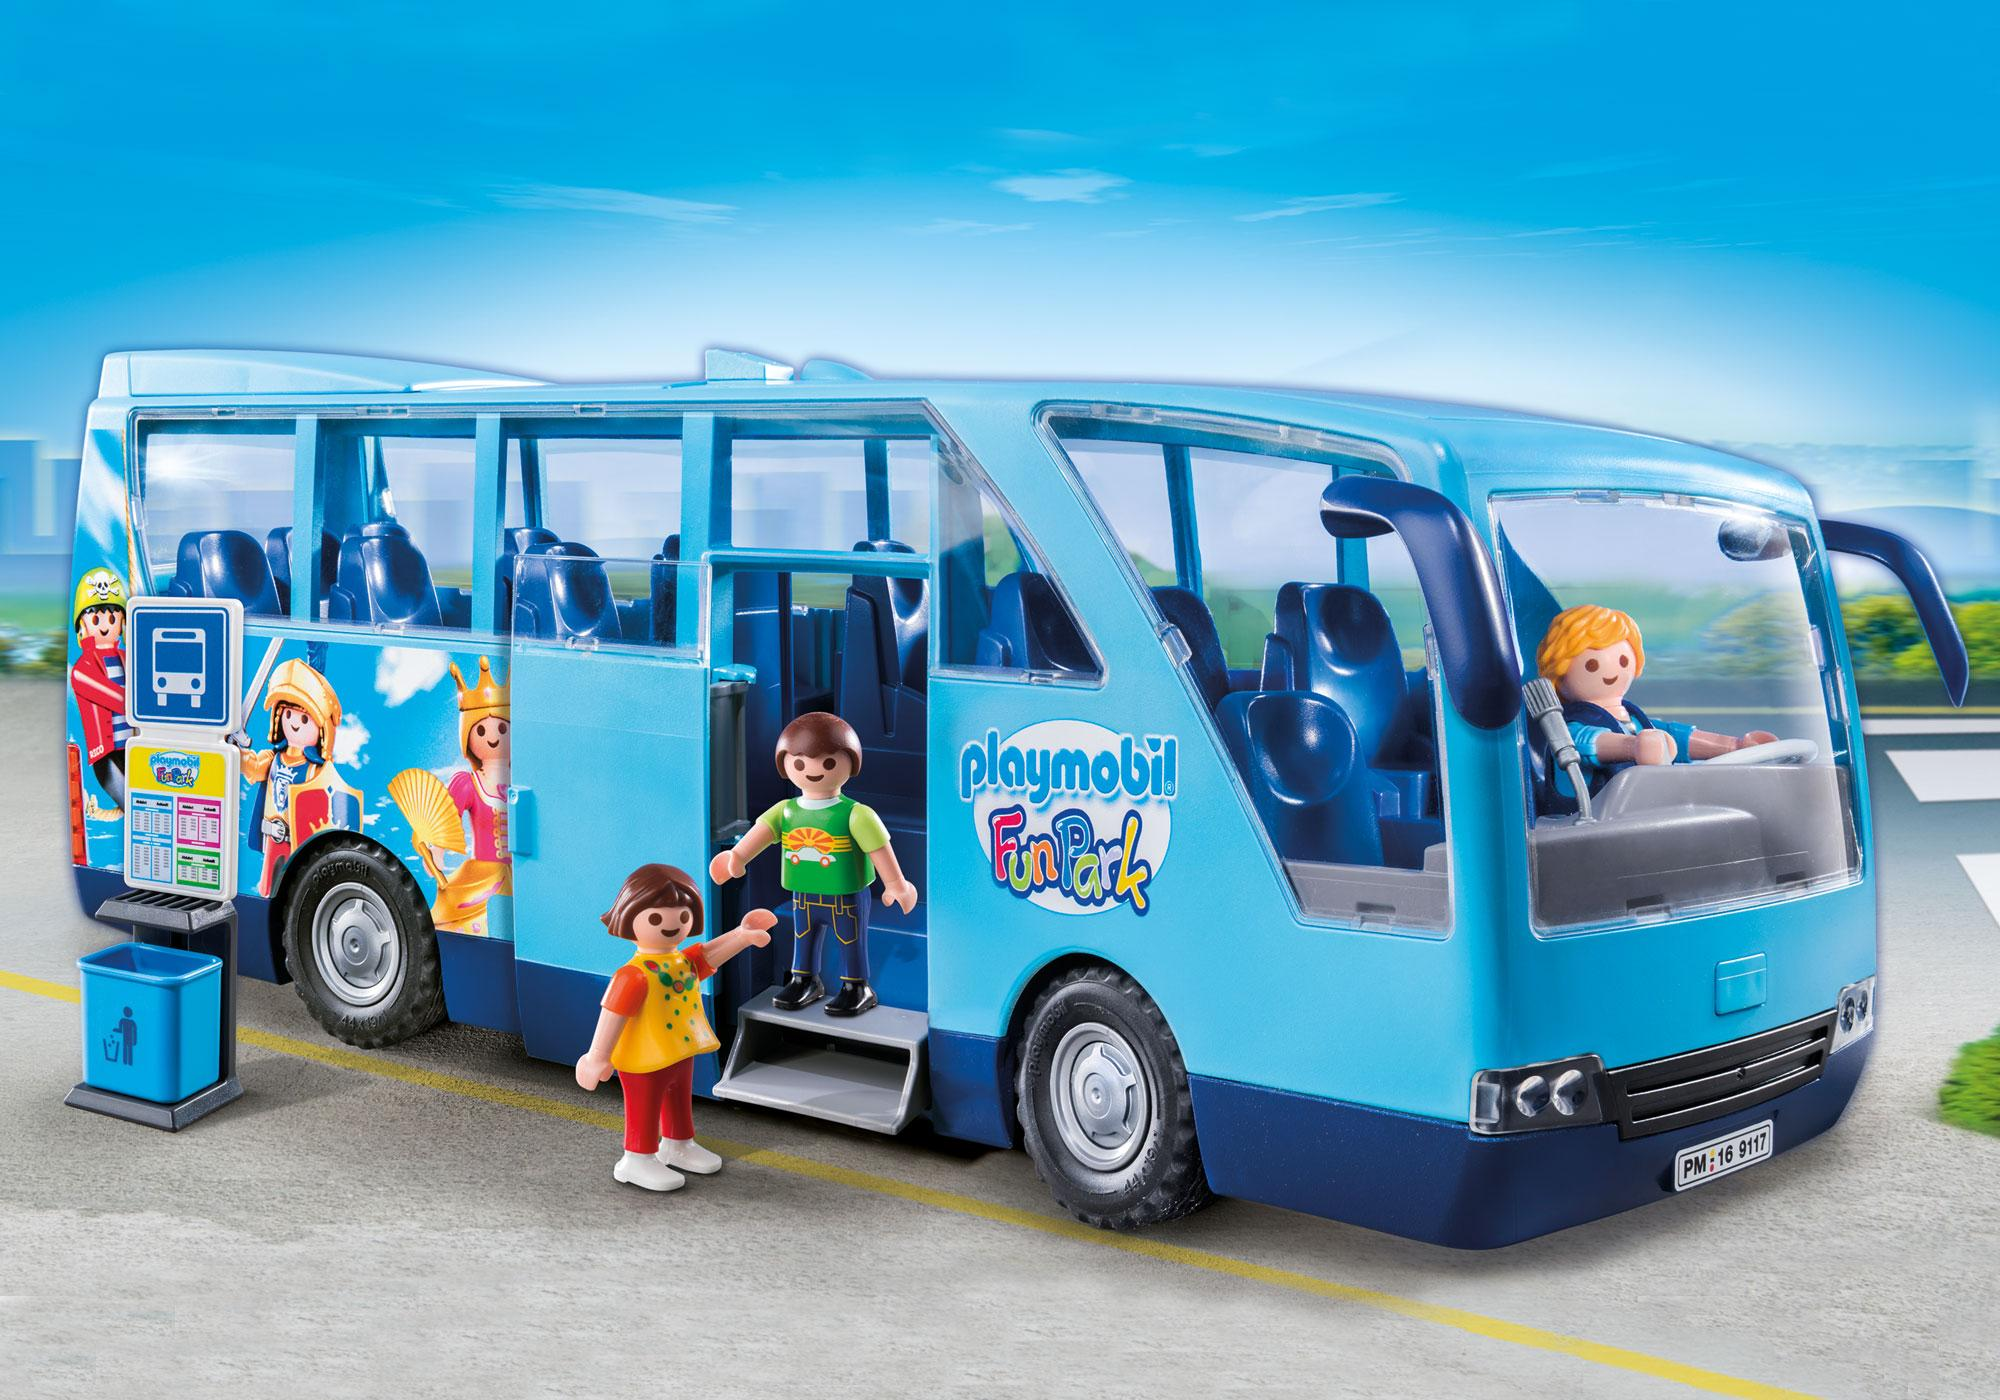 http://media.playmobil.com/i/playmobil/9117_product_detail/PLAYMOBIL-FunPark Bus